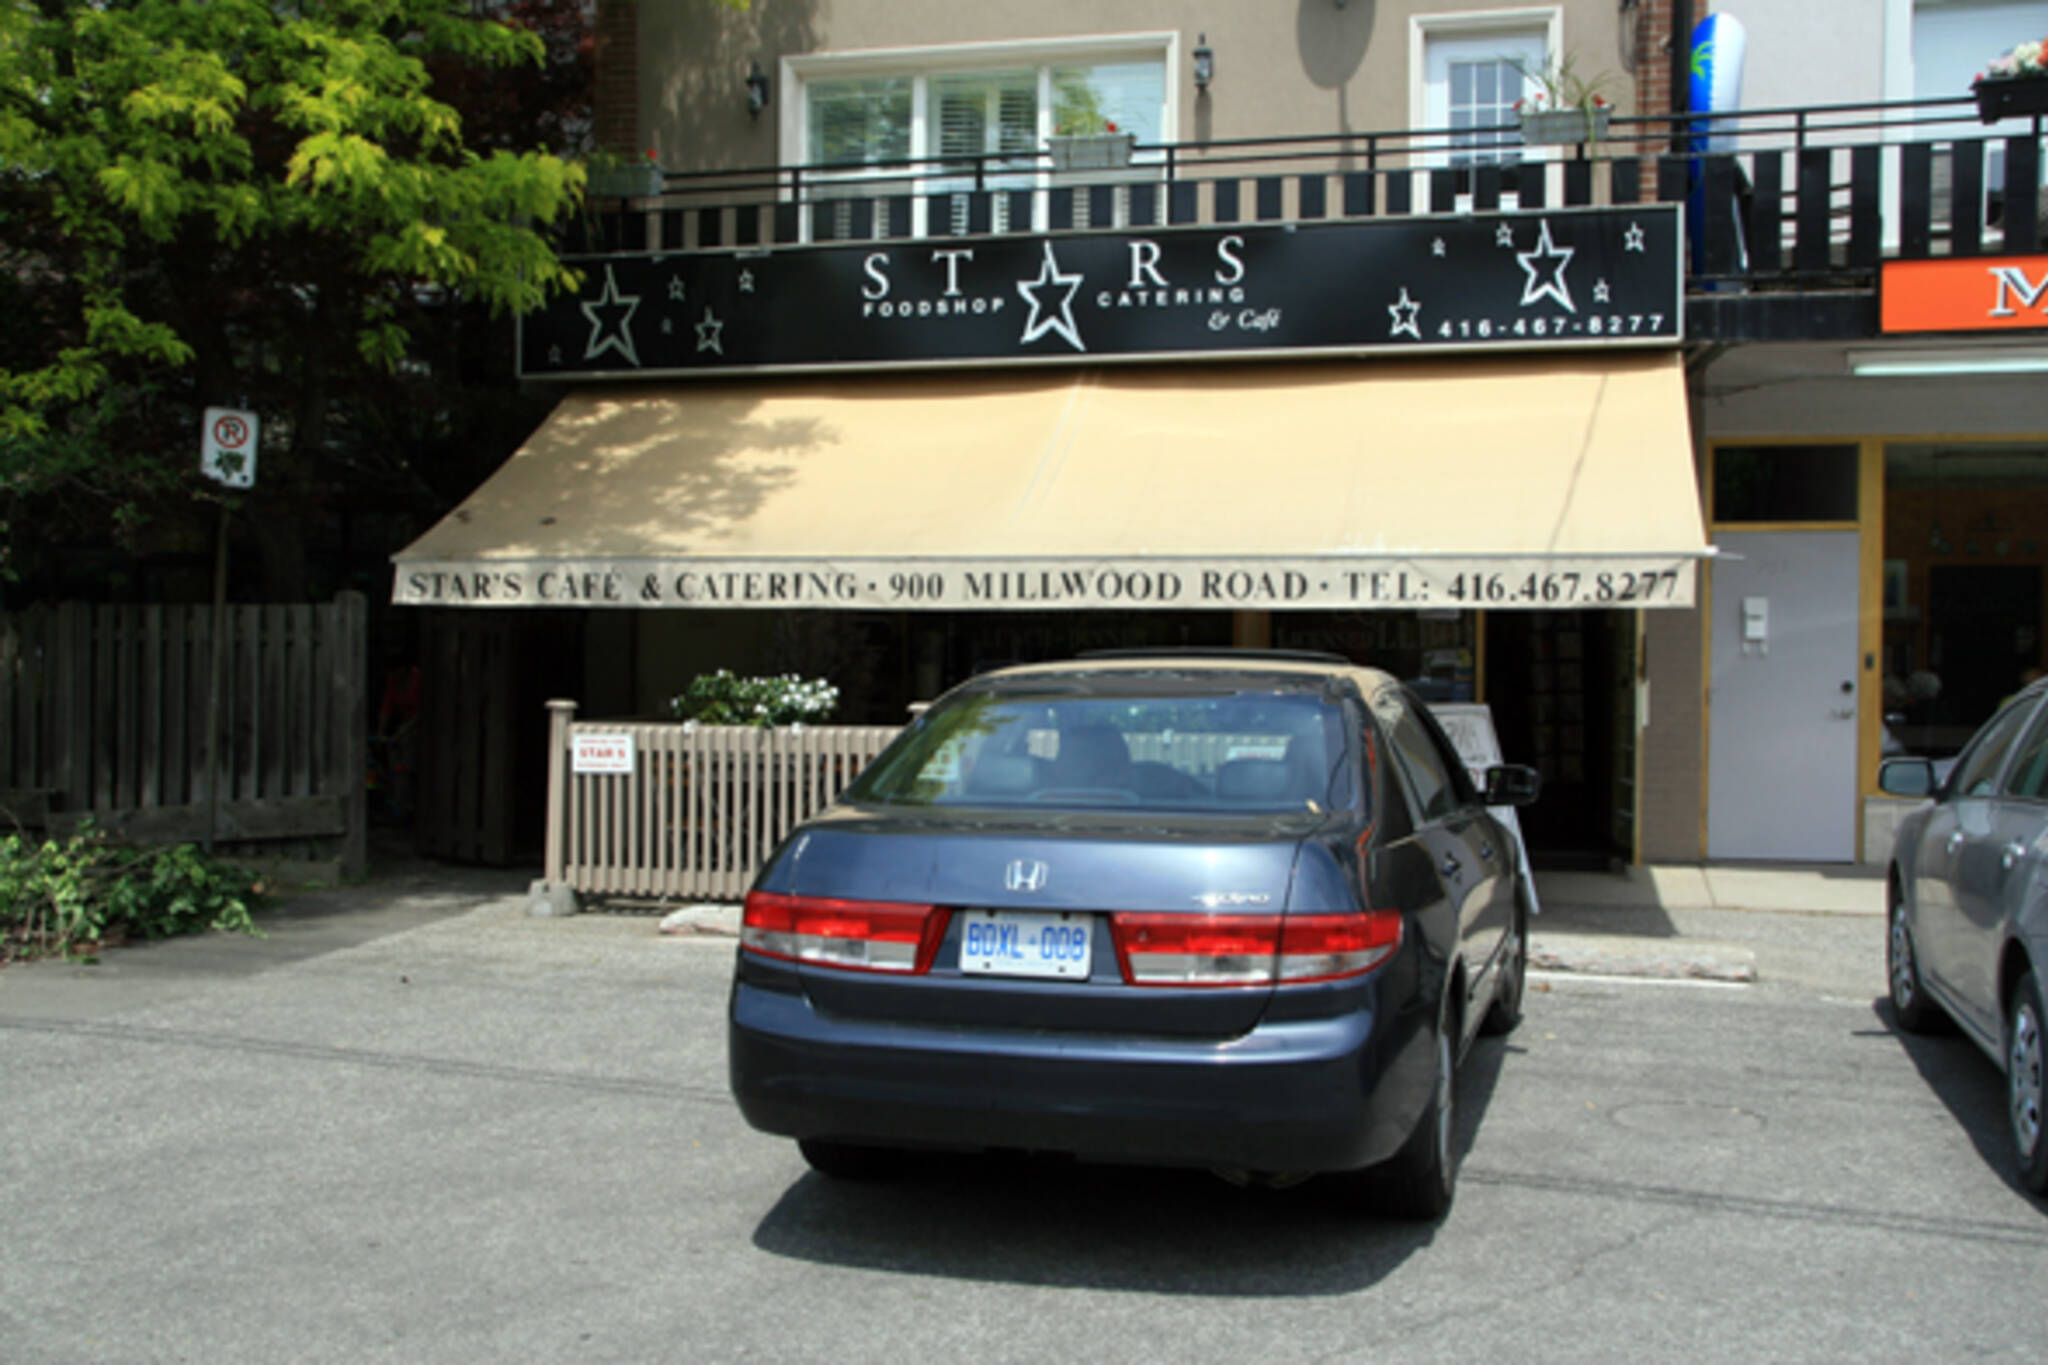 Stars Food Shop